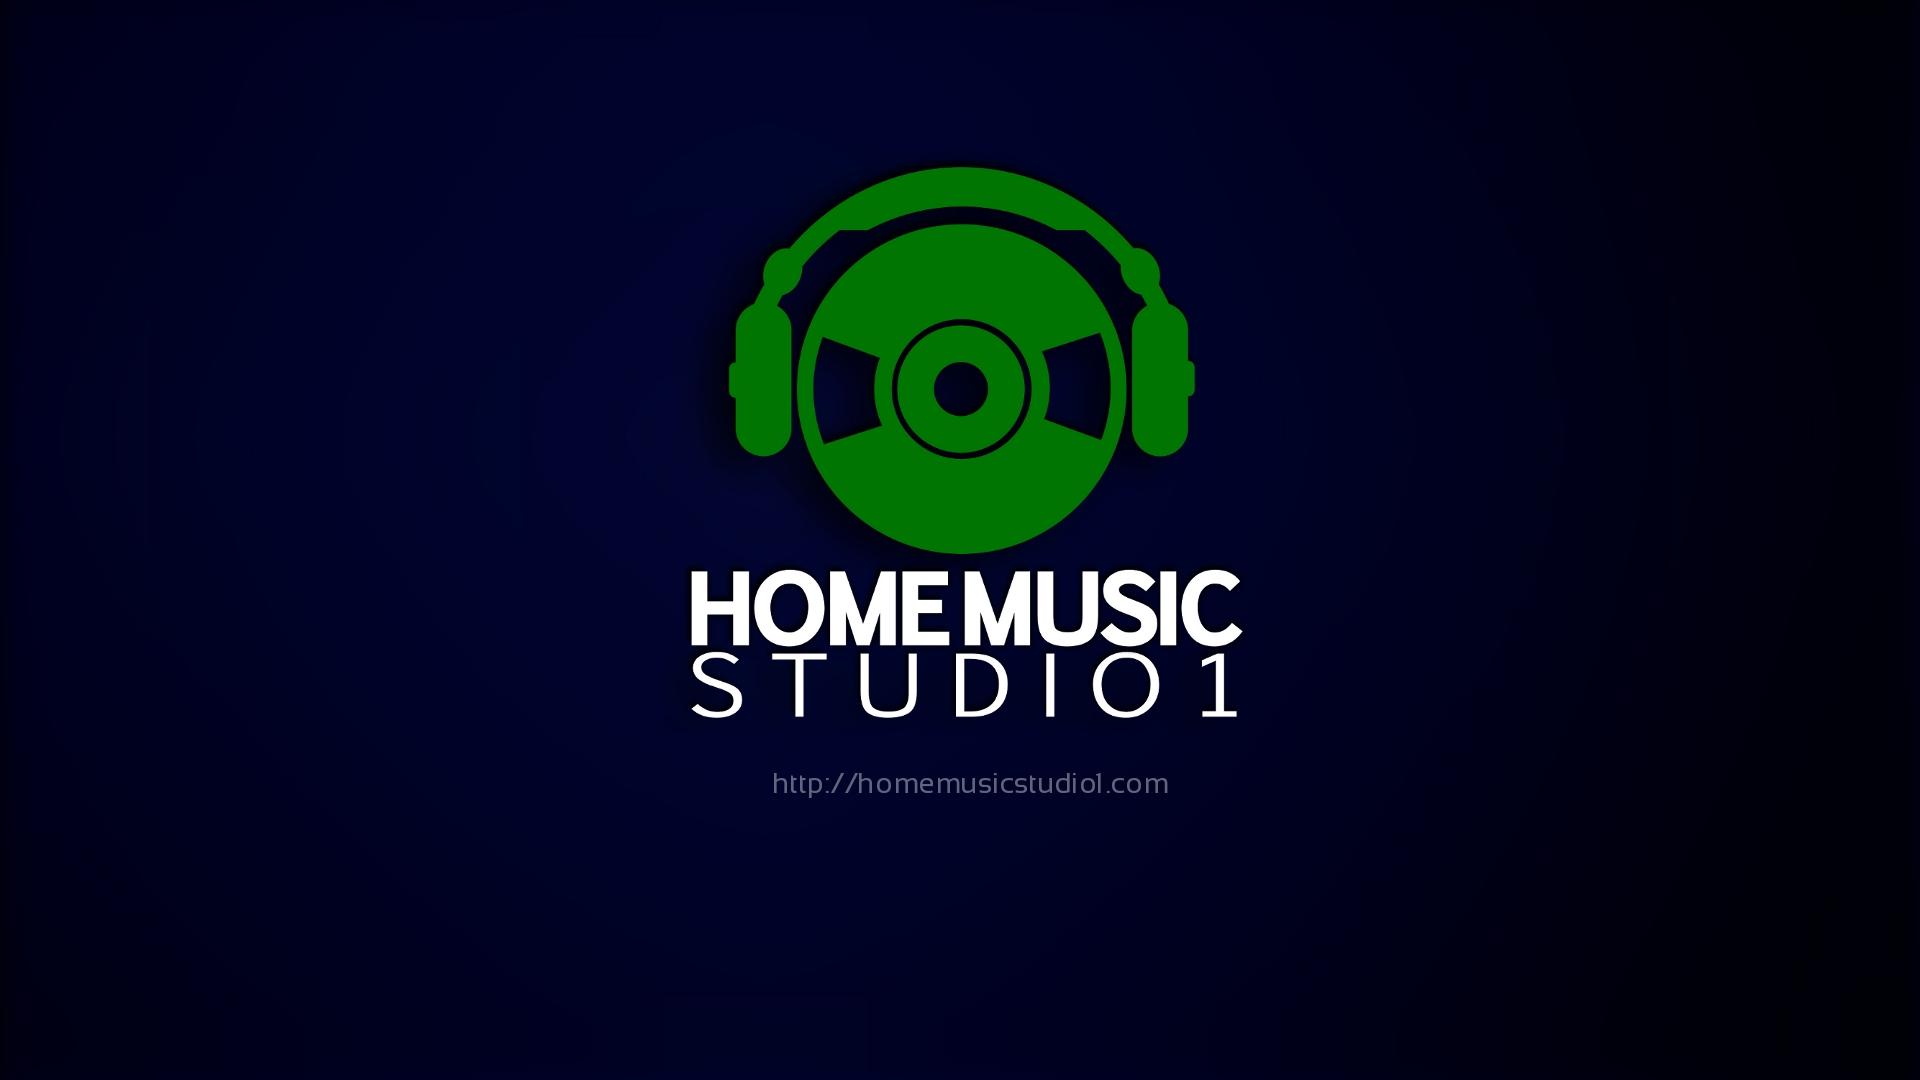 Home Music Studio 1 Wallpapers   Home Music Studio 1 1920x1080